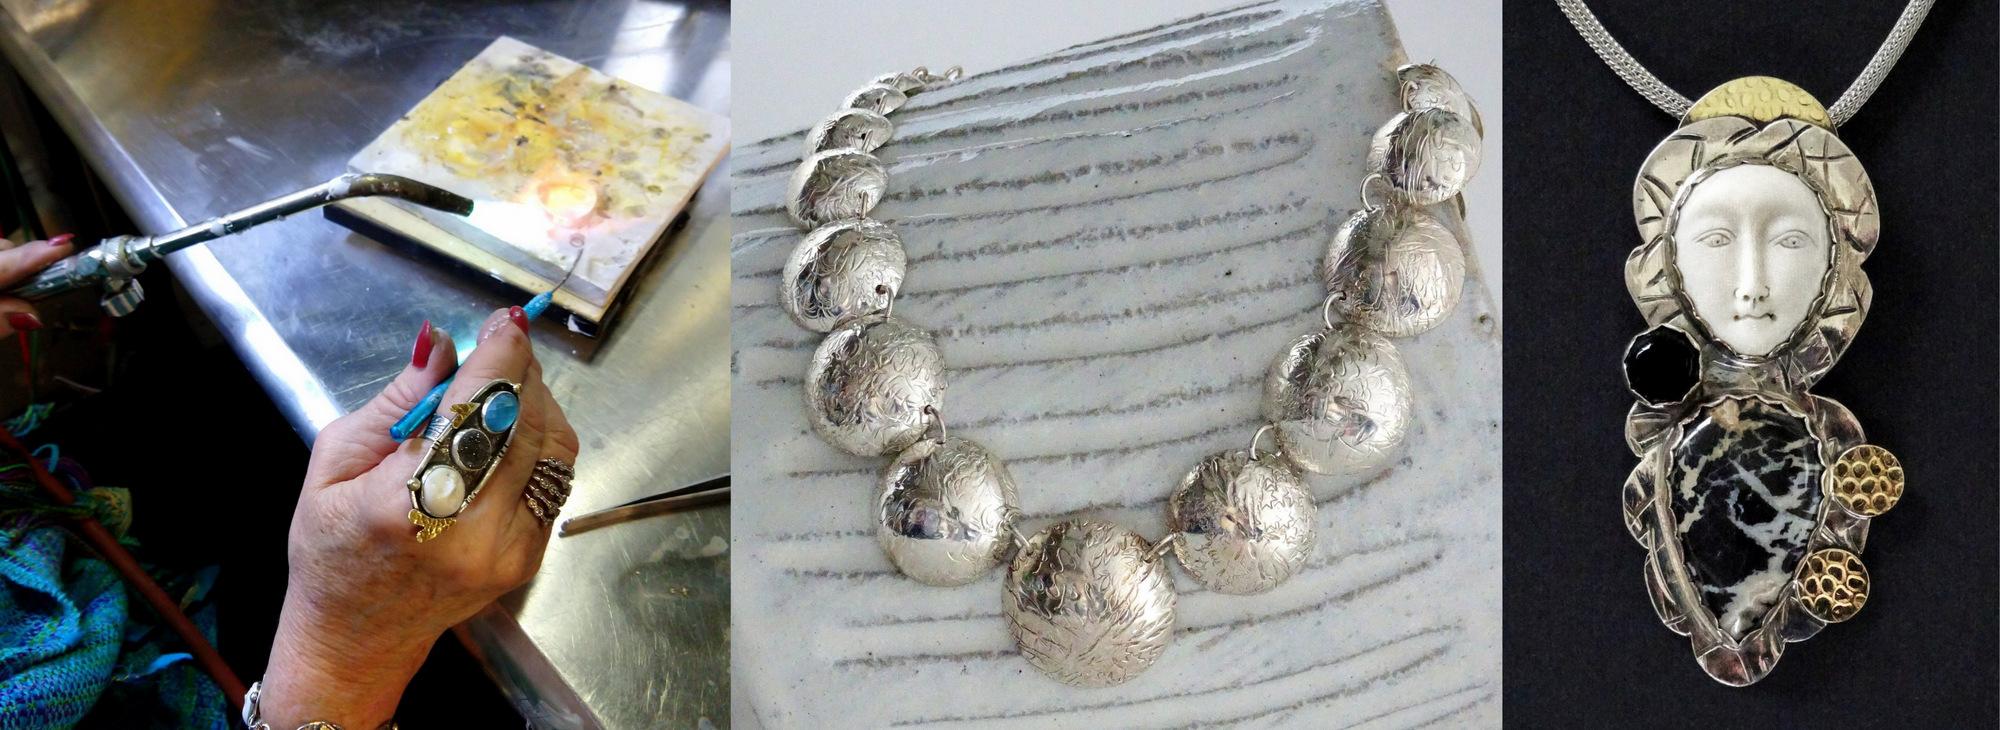 Handcrafted Wearable Art Jewelry, Sylvia McCollum, Western North Carolina.jpg